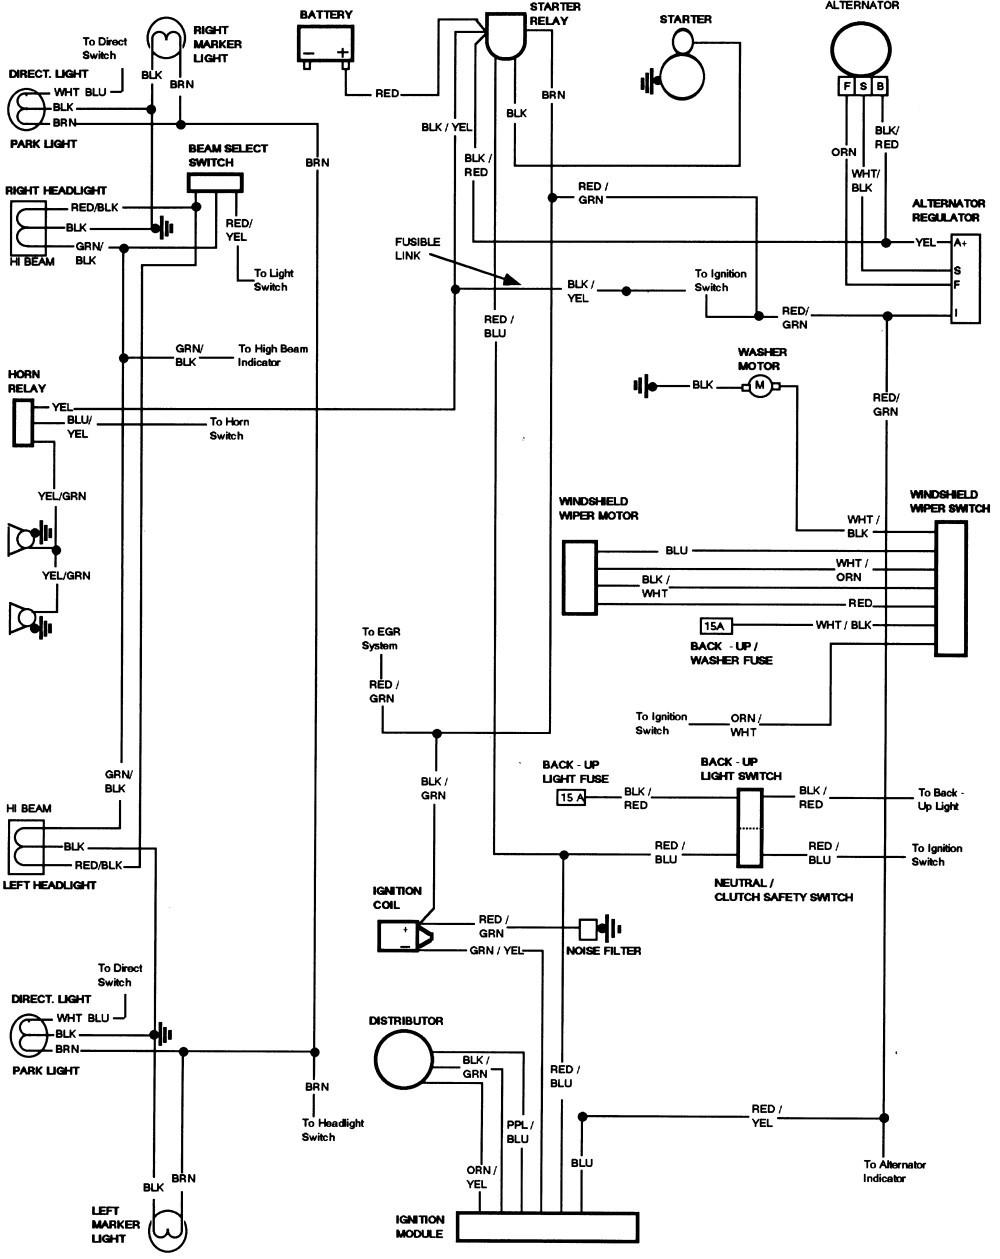 79 F150 Wiring Diagram - Wiring Diagrams Show F Alternator Warning Light Wiring Diagram on